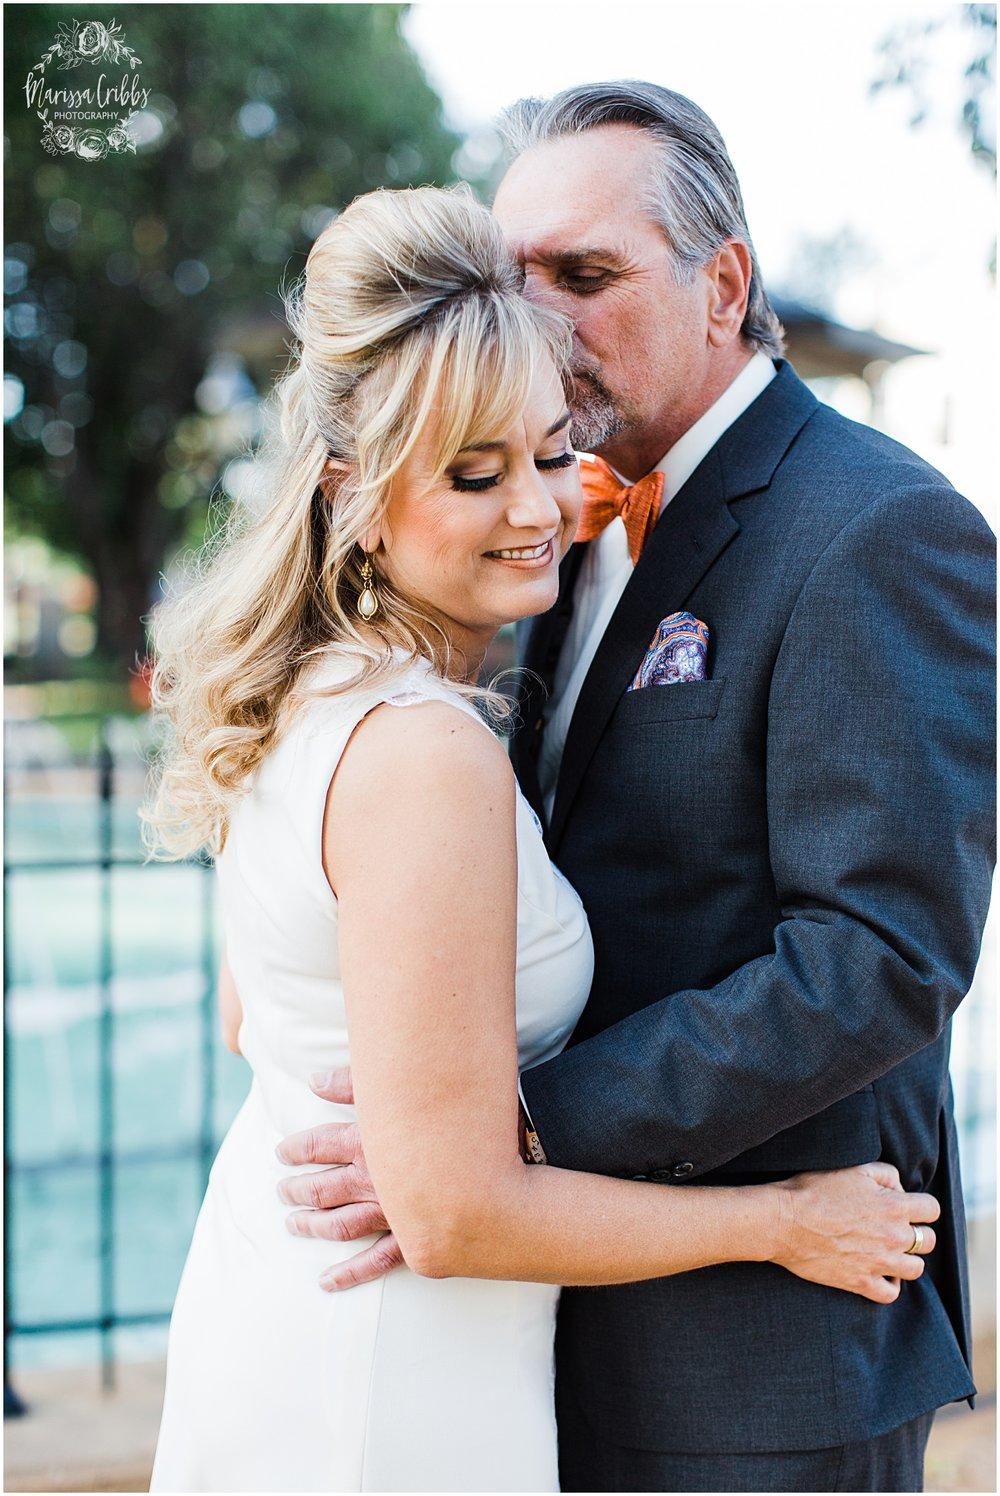 2017 wedding recap | MARISSA CRIBBS PHOTOGRAPHY_4101.jpg